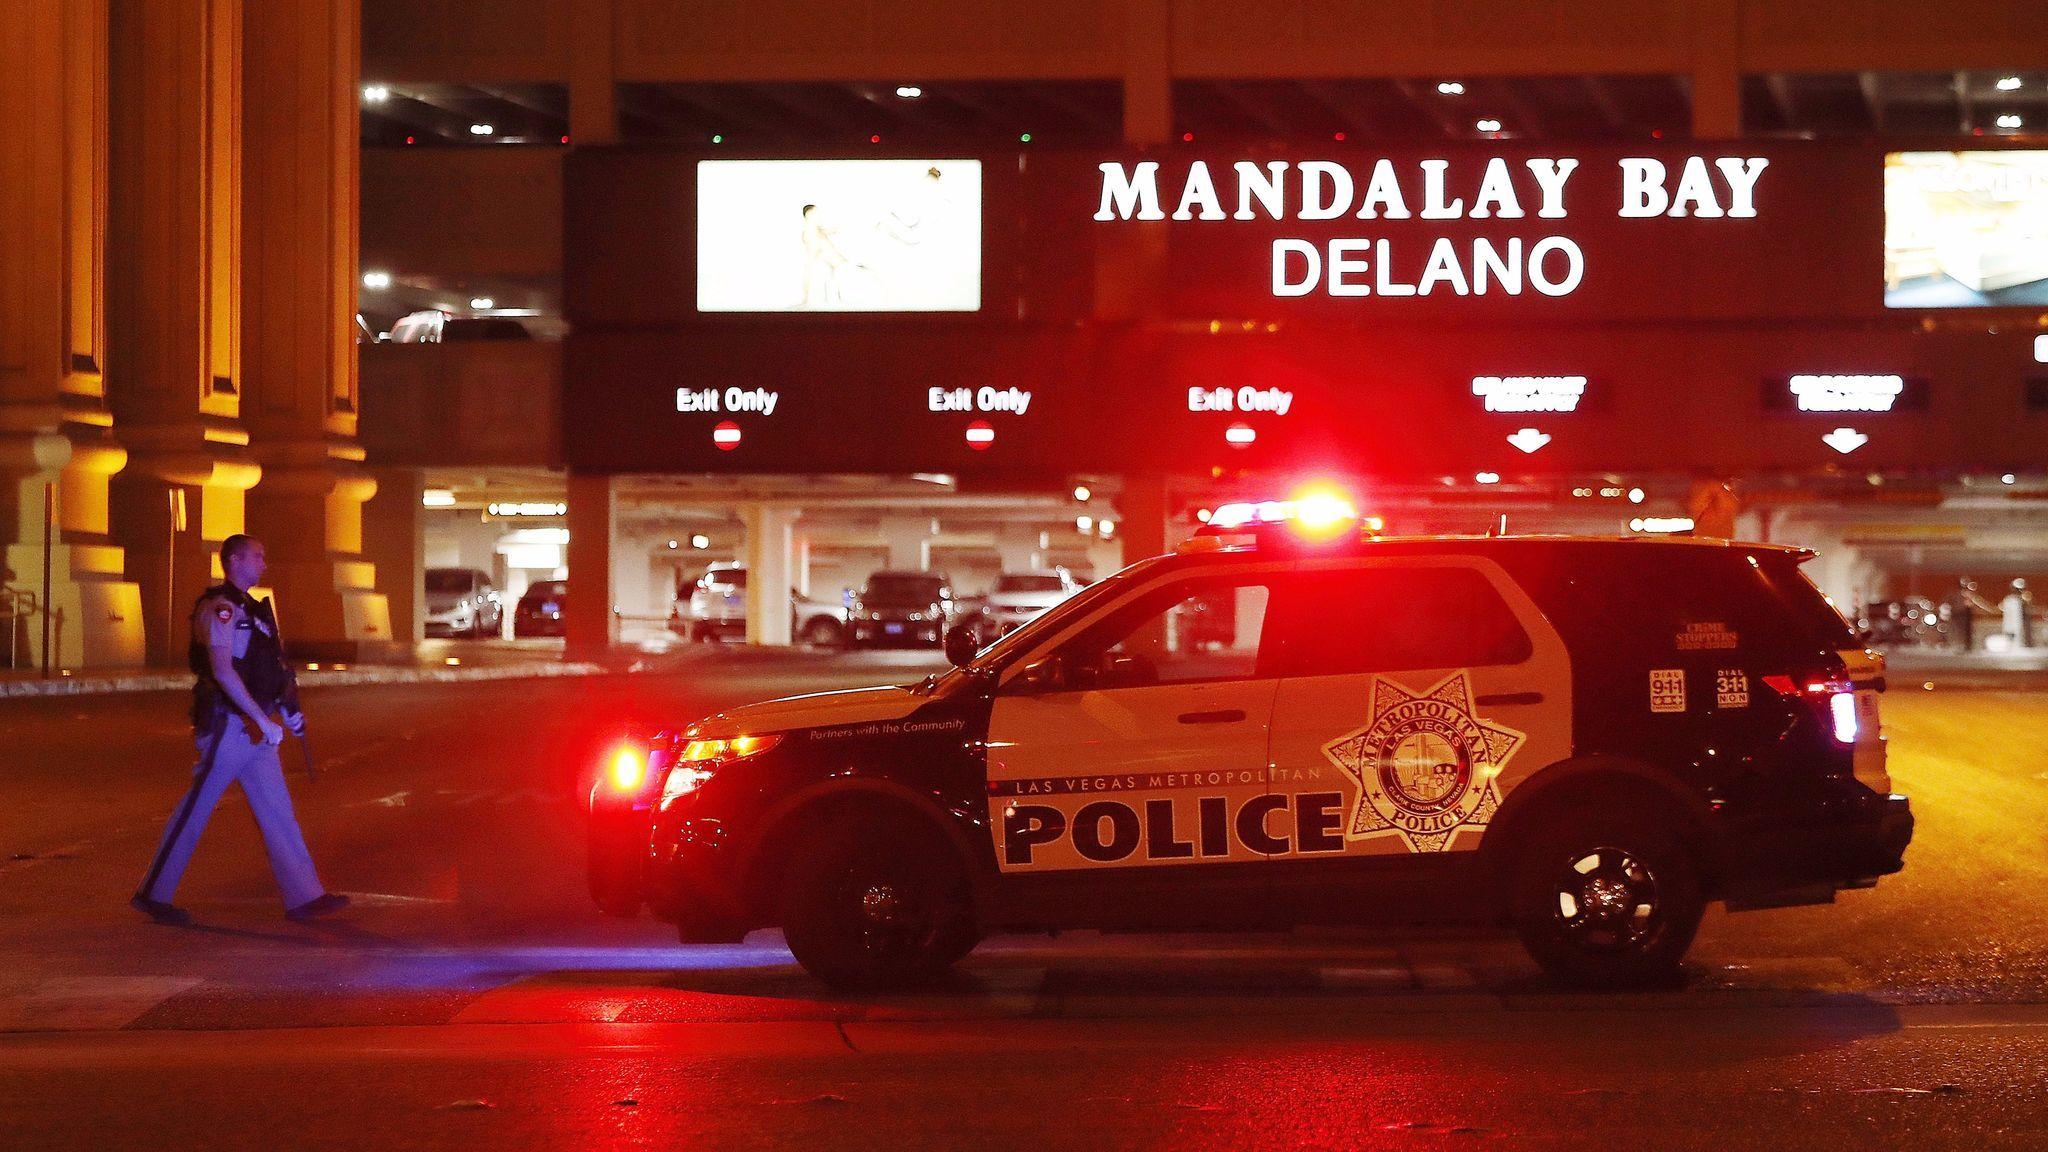 Las Vegas Metropolitan Police outside the Mandalay Bay hotel near the scene of the mass shooting at the Route 91 Harvest festival on Las Vegas Boulevard.